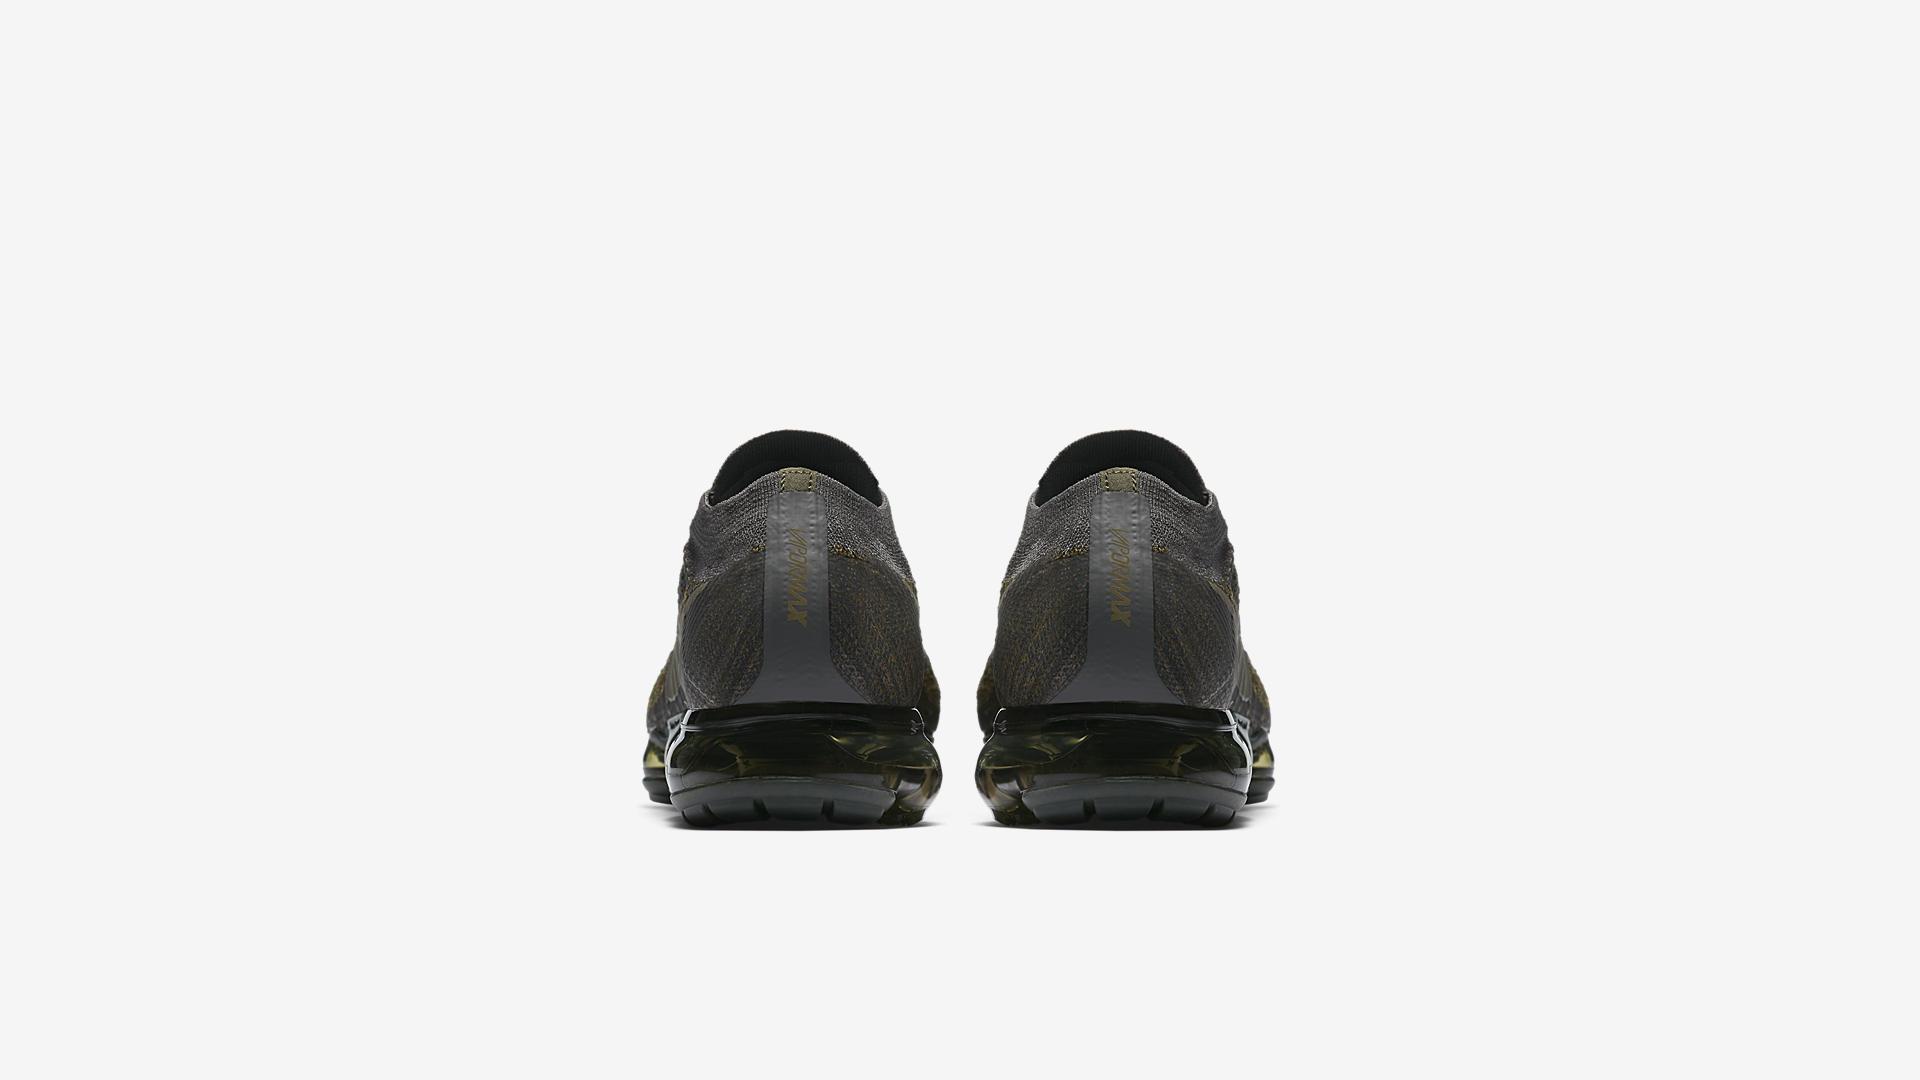 Nike Air VaporMax Midnight Fog 899473 004 3